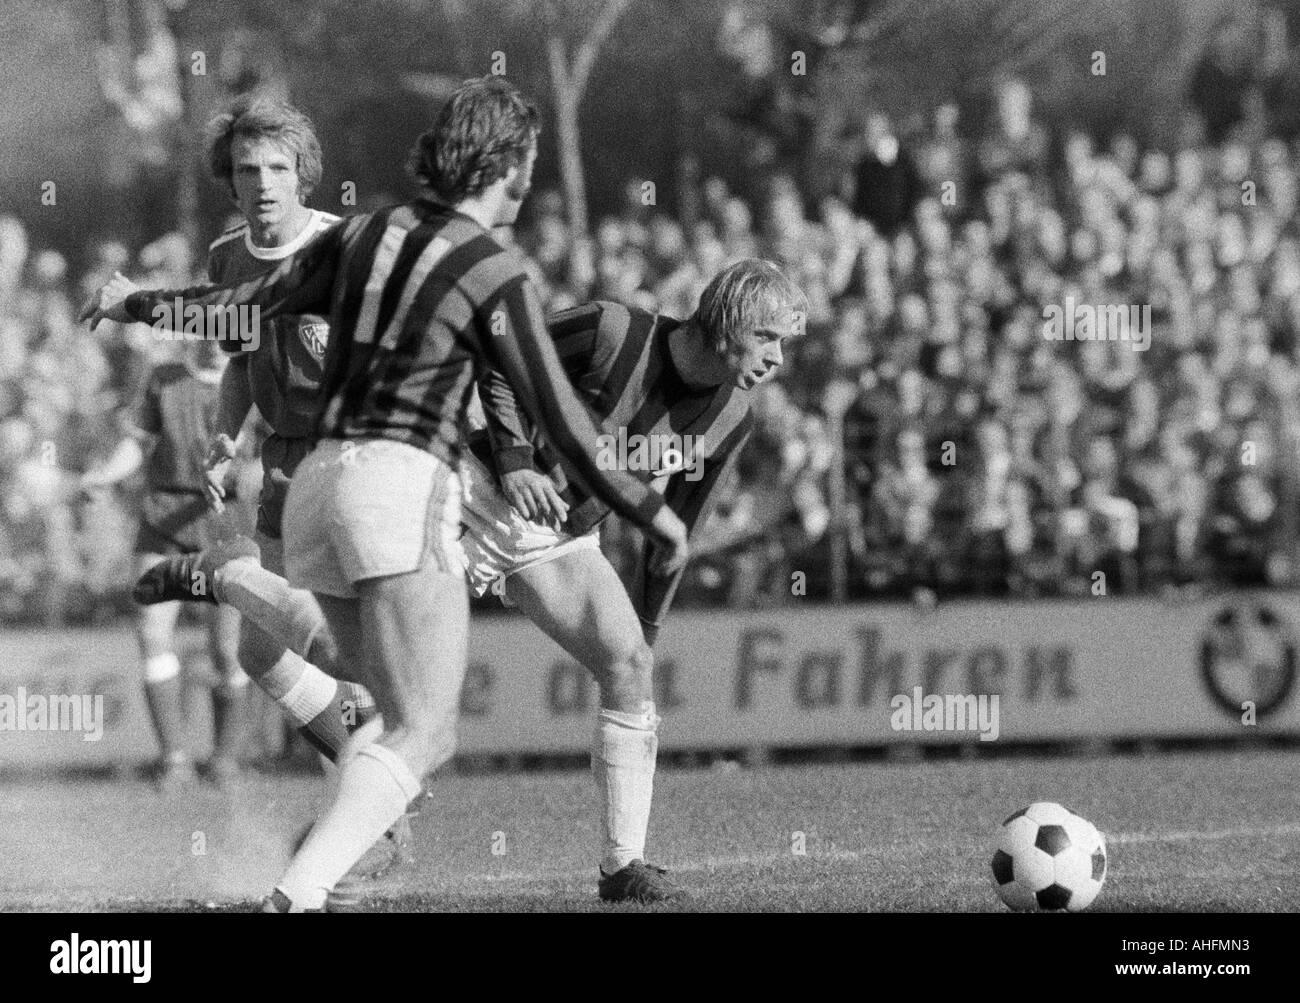 football, Bundesliga, 1971/1972, VfL Bochum versus Hanover 96 2:2, Stadium at the Castroper Strasse in Bochum, scene of the match, f.l.t.r. Dieter Zorc (Bochum), a Hannover player (11), Horst Bertl (96) - Stock Image